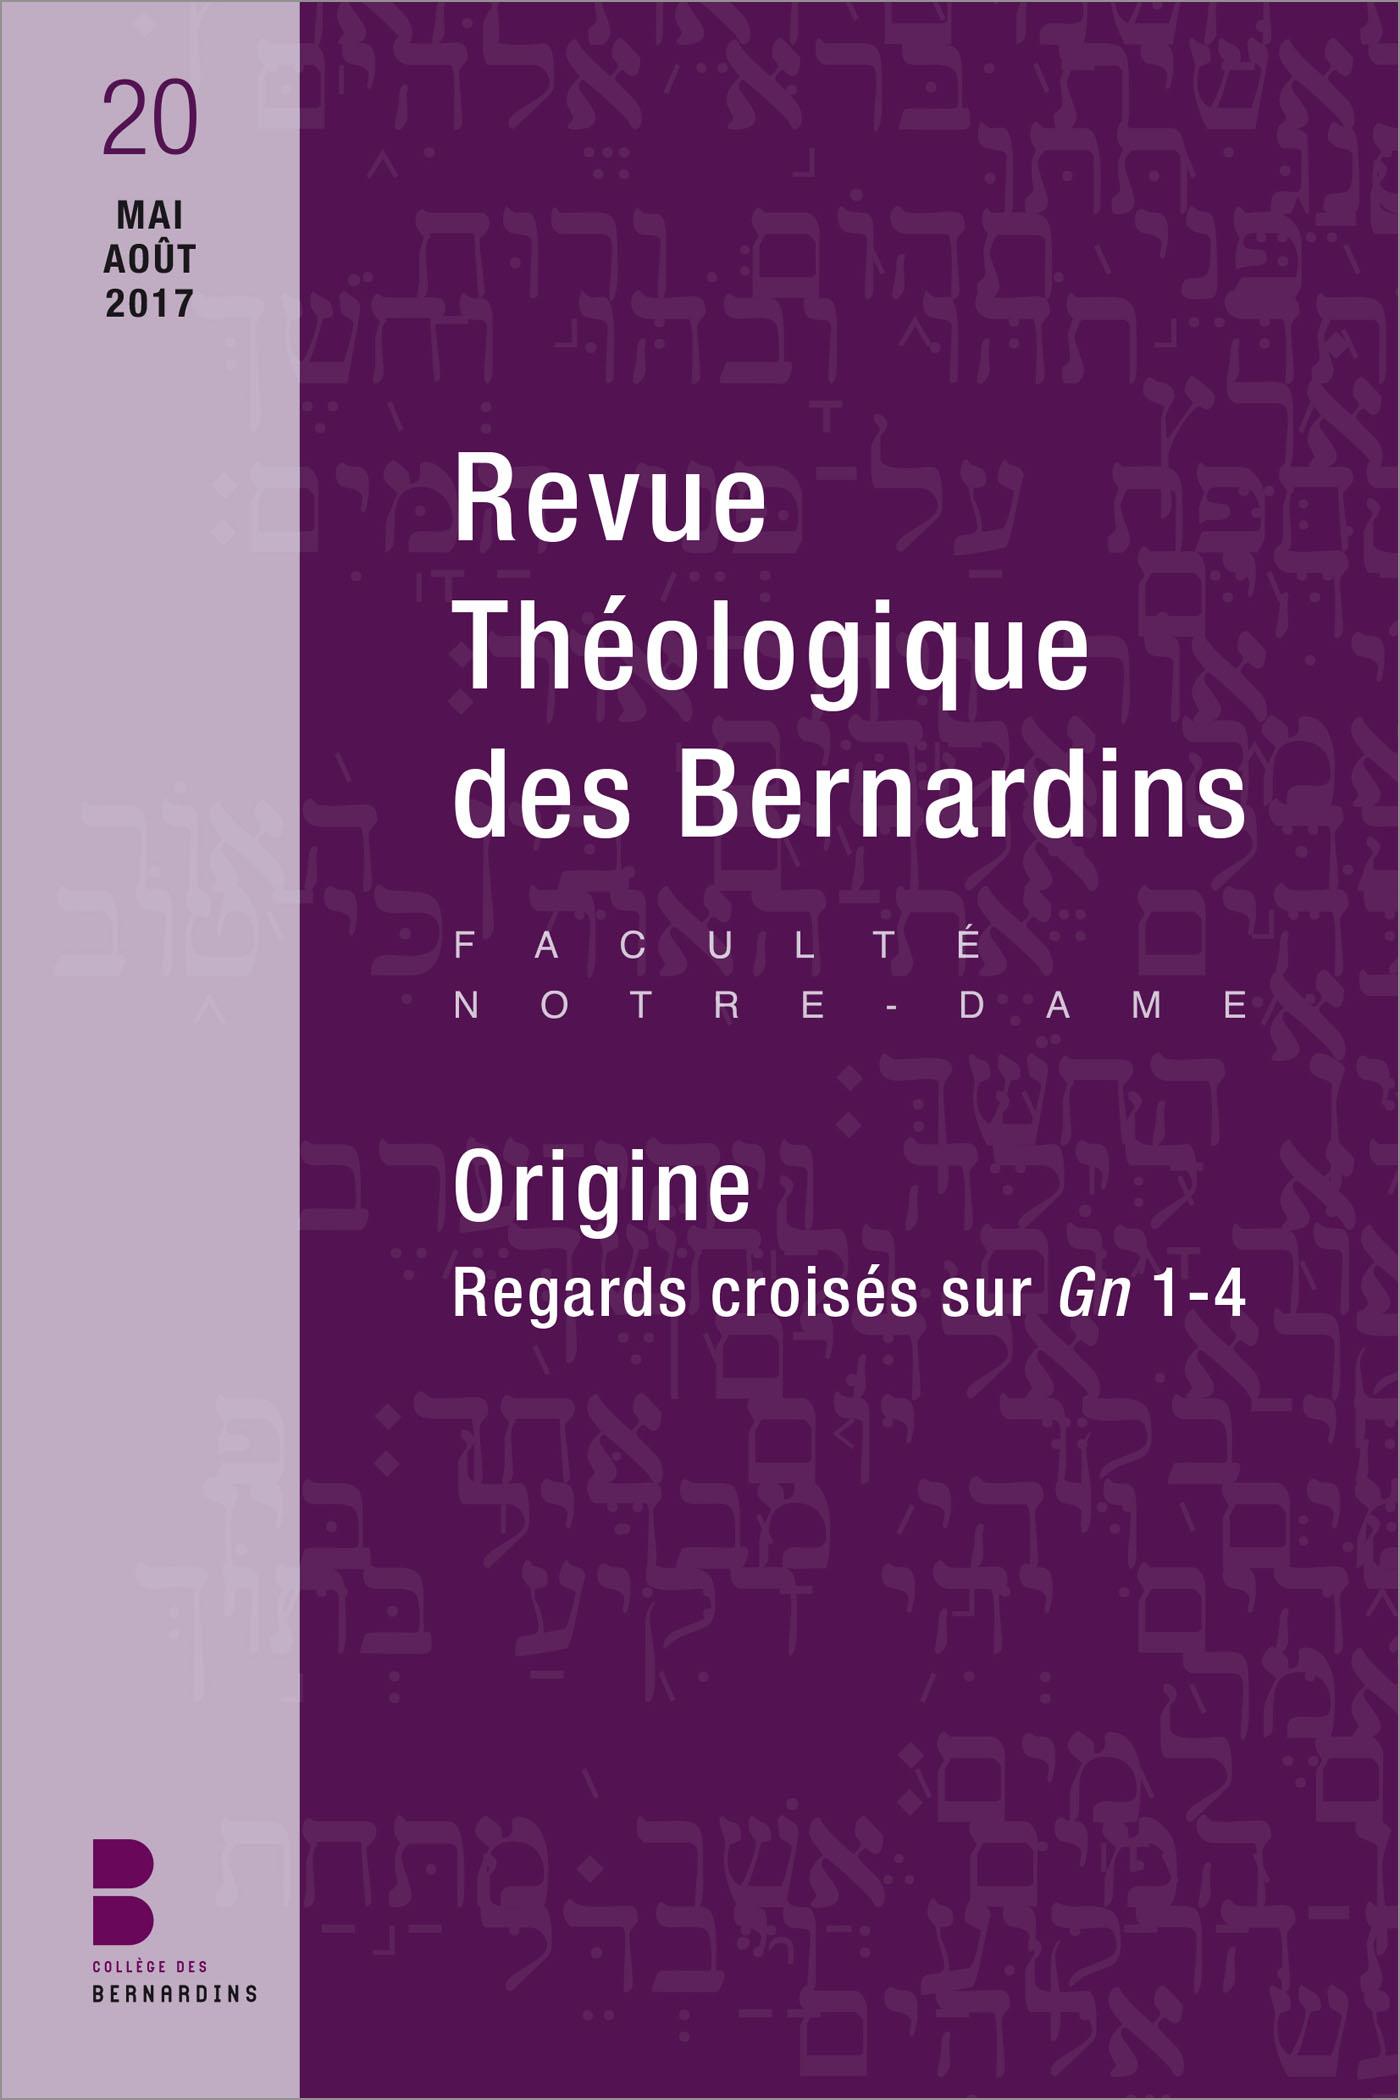 Revue Théologique des Bernardins n°20